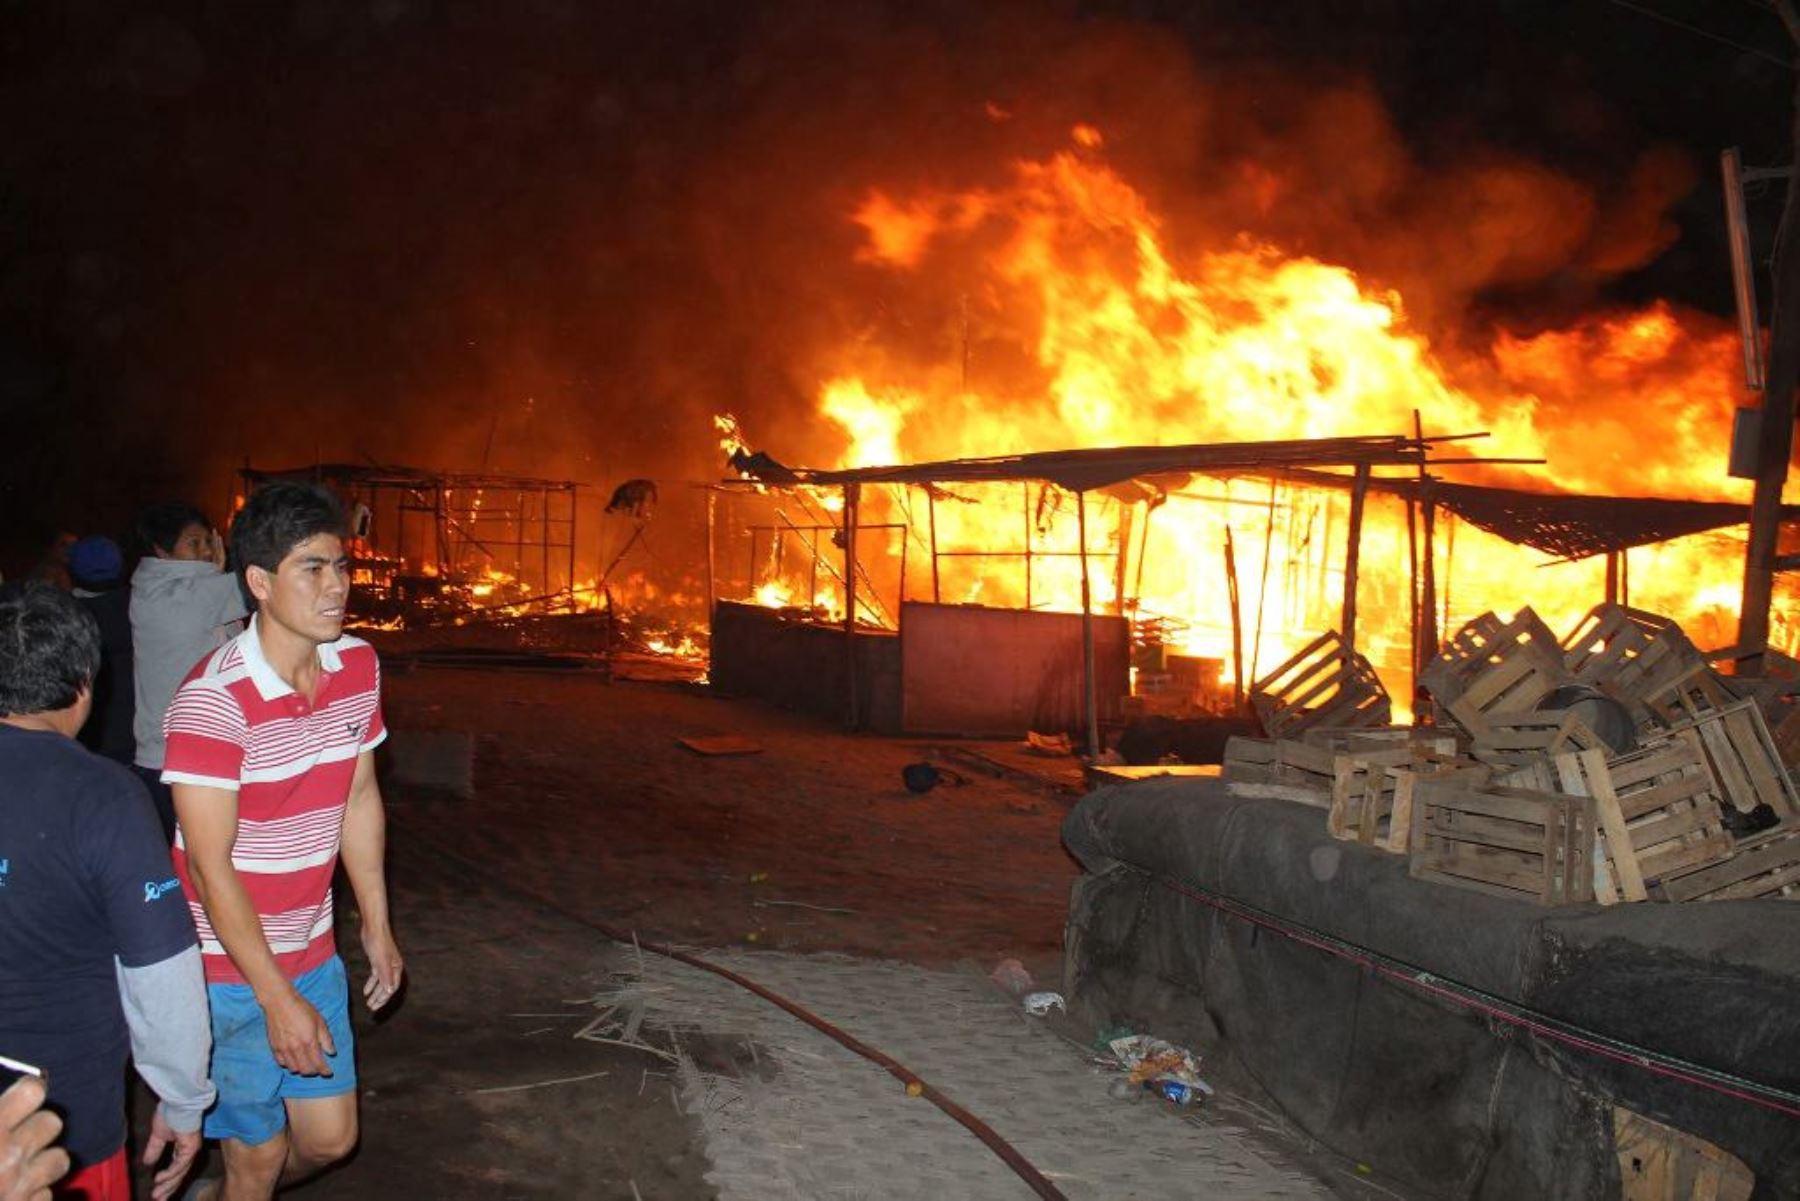 A S/. 2.5 mllns. ascenderían pérdidas económicas por incendio en mercado de Chimbote. Foto: ANDINA